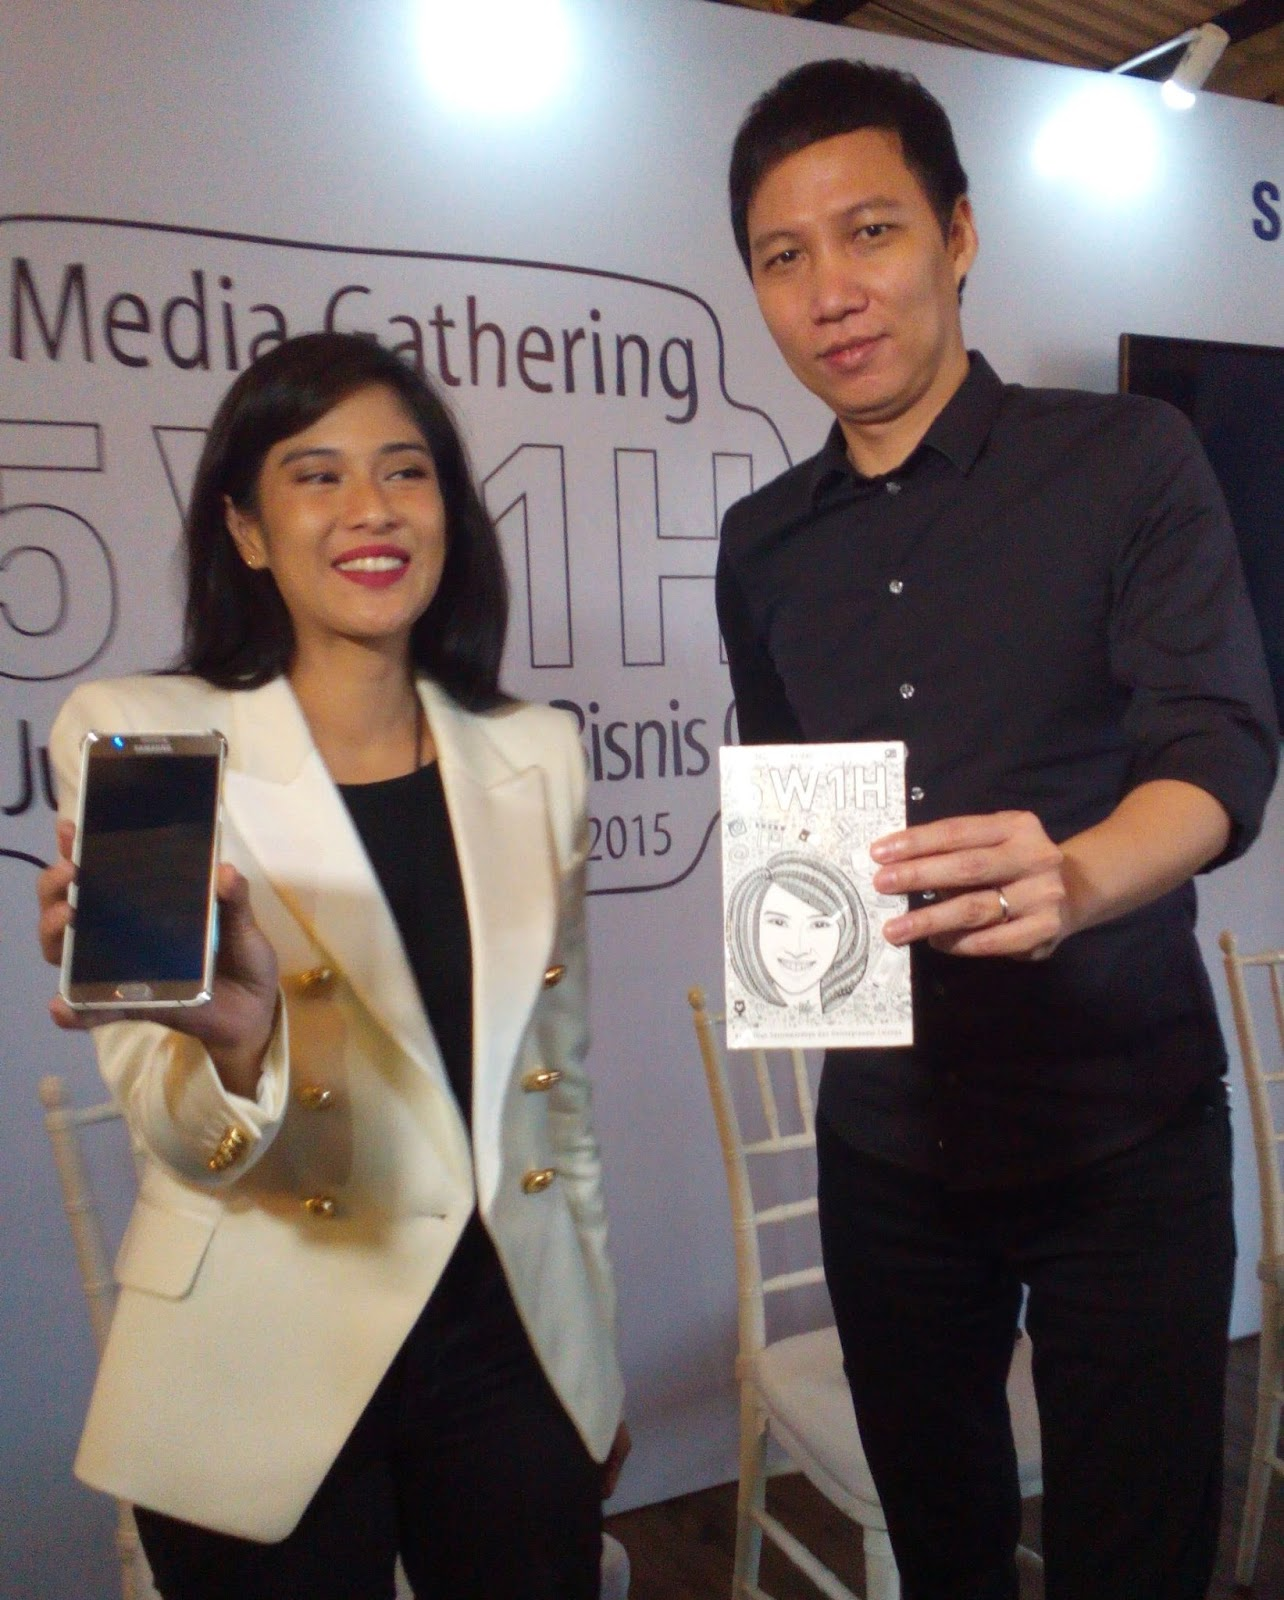 Ikea Indonesia On Twitter Ini Salah Satu Ruang Keluarga: Sapadunia: Panduan Menjadi Onlinepreneur Dalam 5W1H Karya